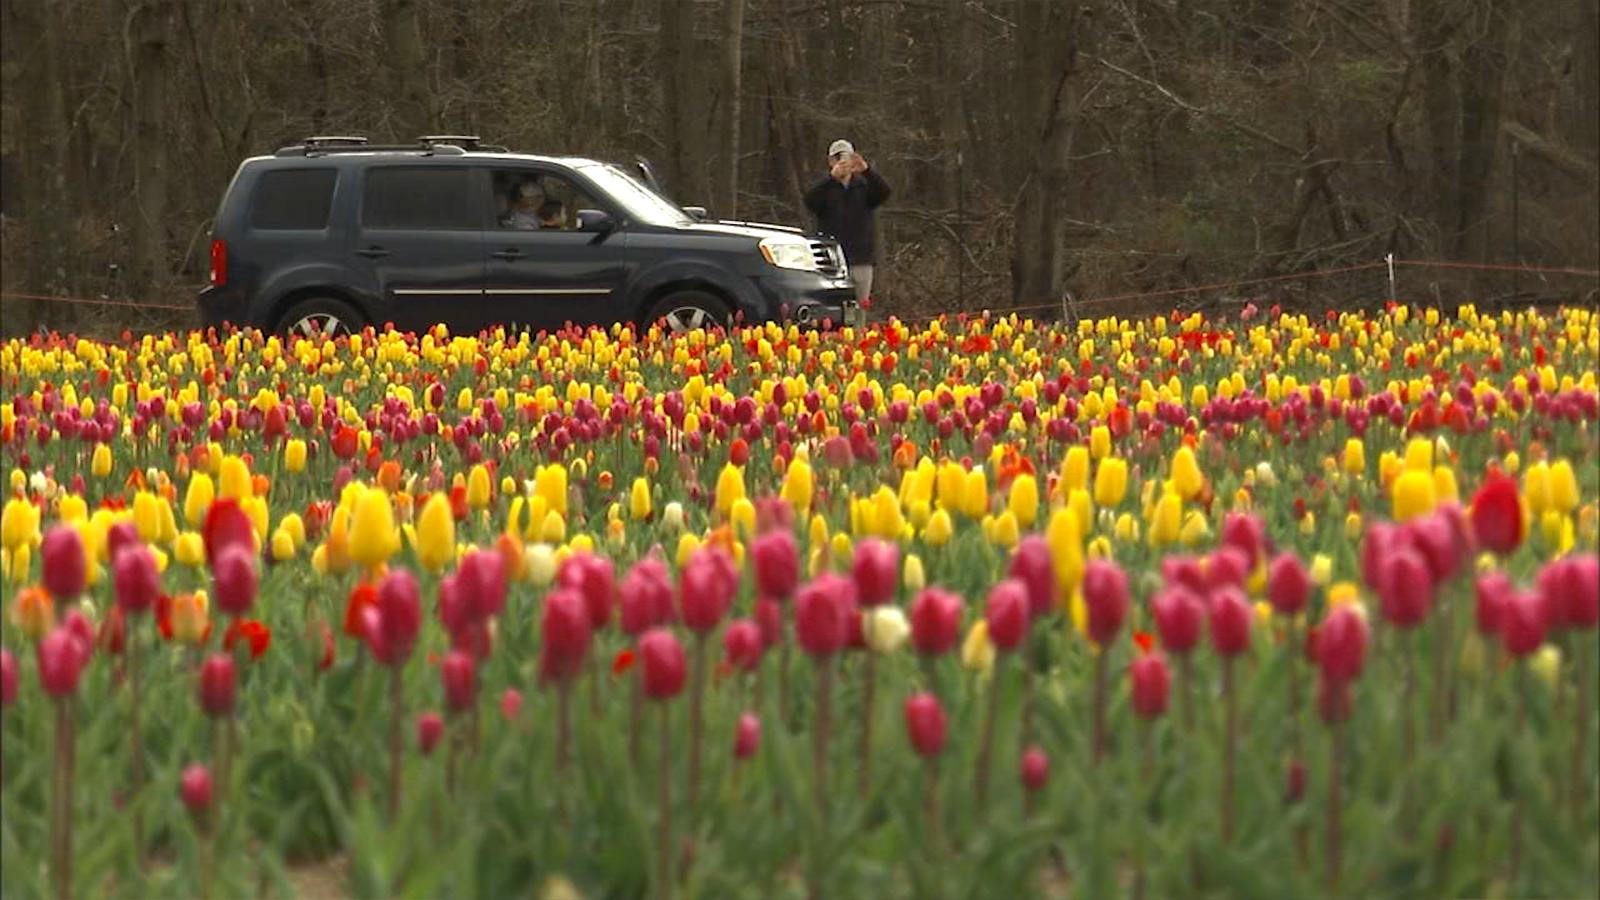 It S Still Tulip Time At This Drive Thru Flower Farm Internewscast